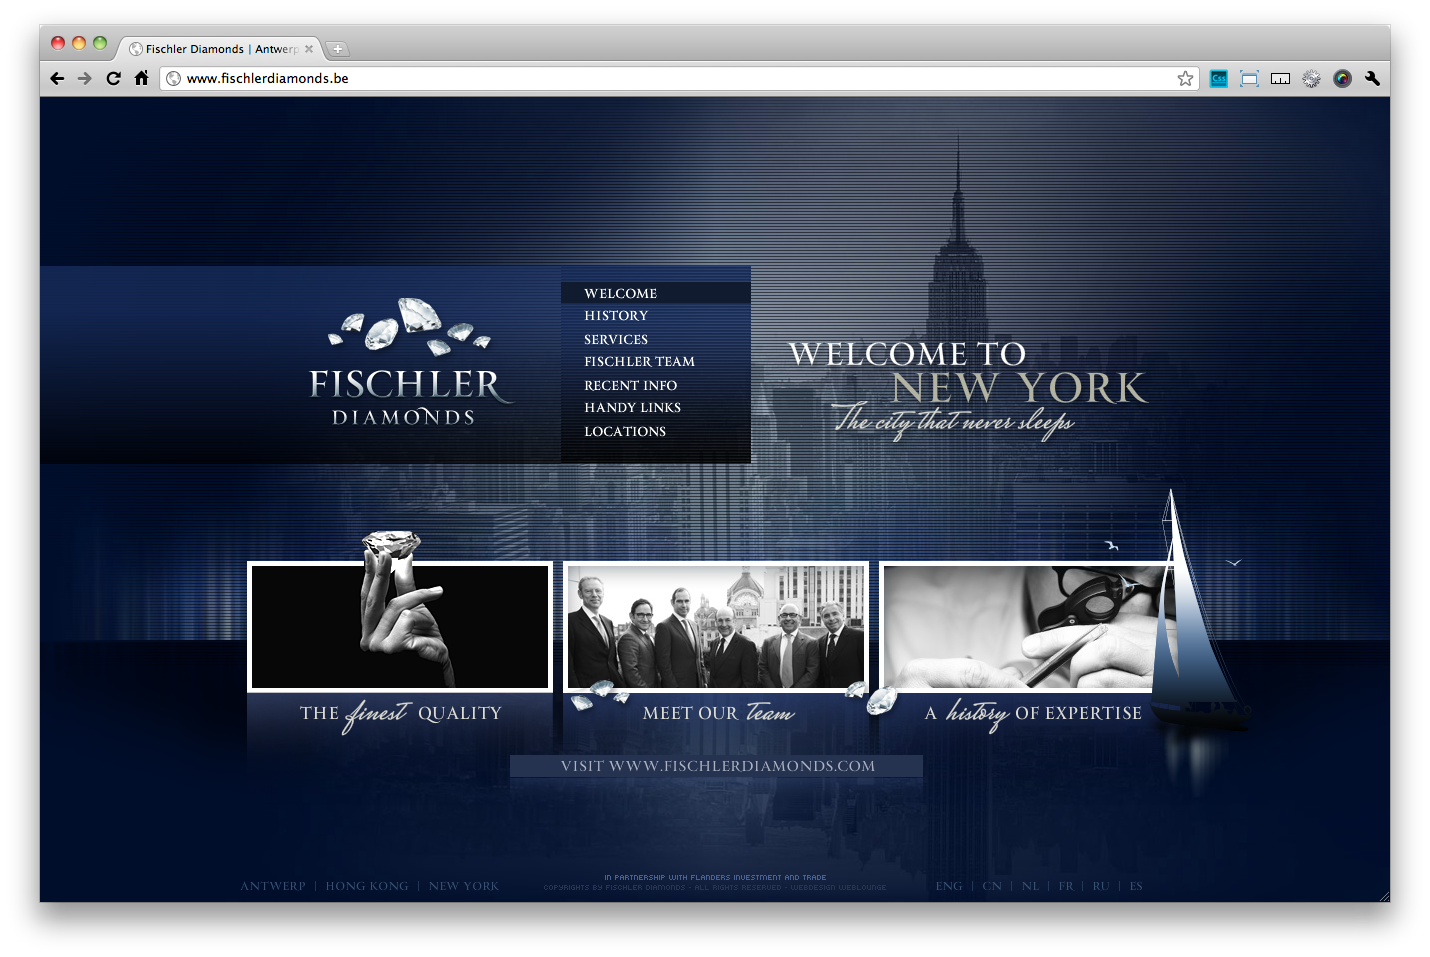 Fischler Diamonds In New York Antwerp And Hong Kong Http Www Fischlerdiamonds Be Web Grid Cr Web Design Web Design User Interface User Interface Design